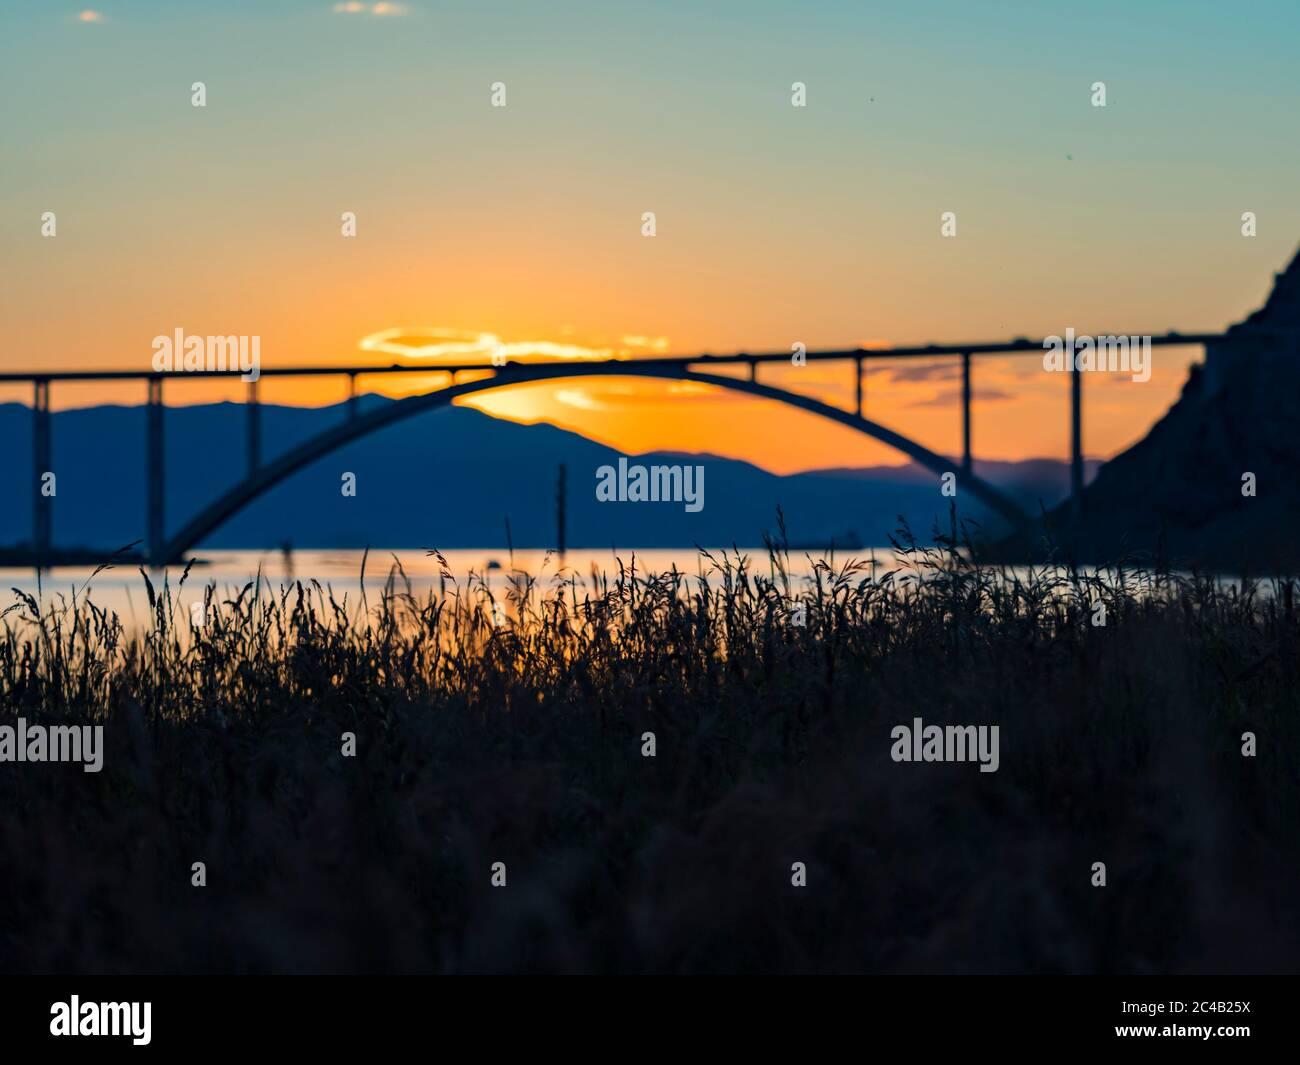 Sunset landscape silhouette silhouetting grass in foreground bridge mainland to island Krk Croatia Stock Photo